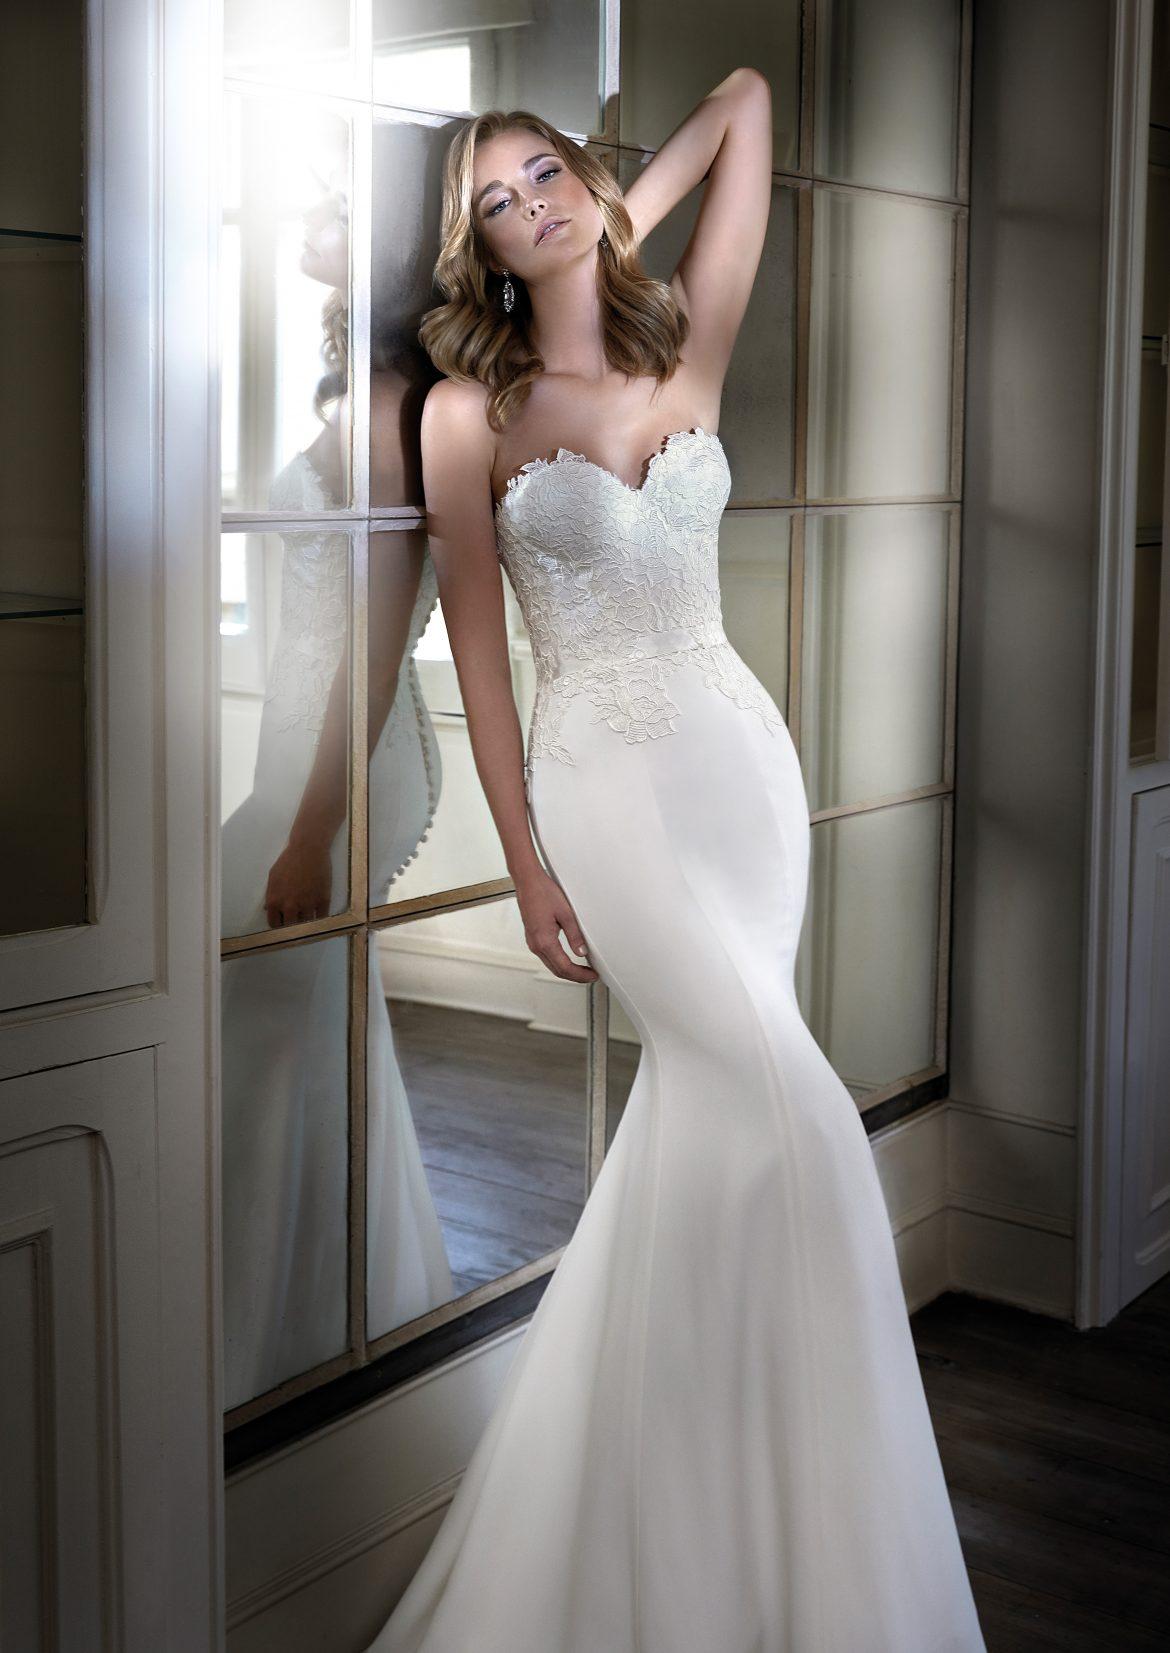 Cara luxury wedding dresses by Caroline Castigliano